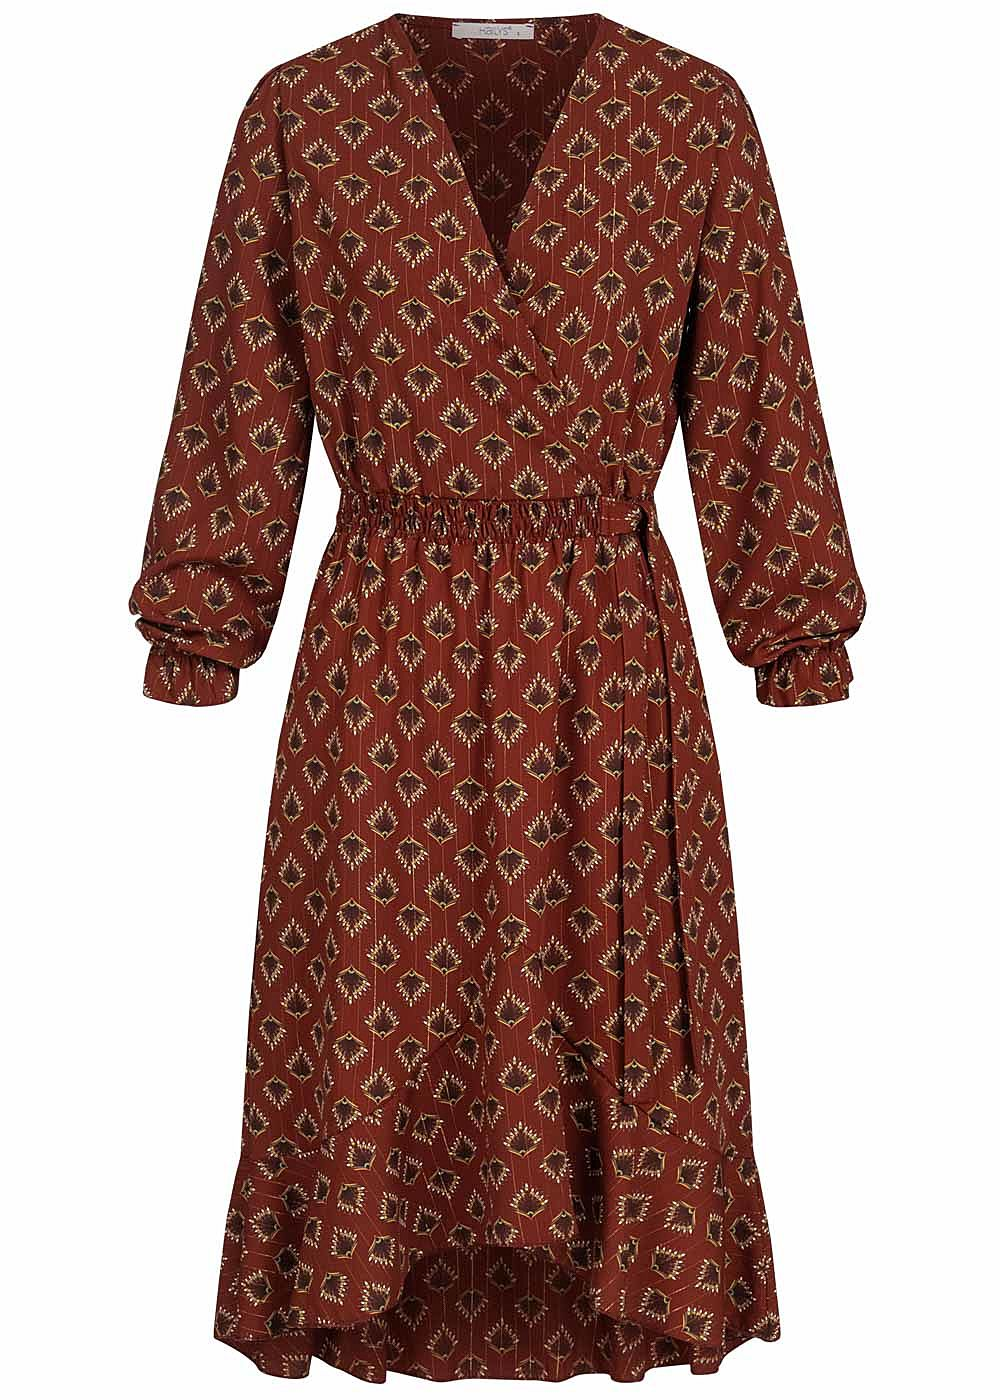 Hailys Damen Chiffon V-Neck Midi Kleid Floraler Print caramel